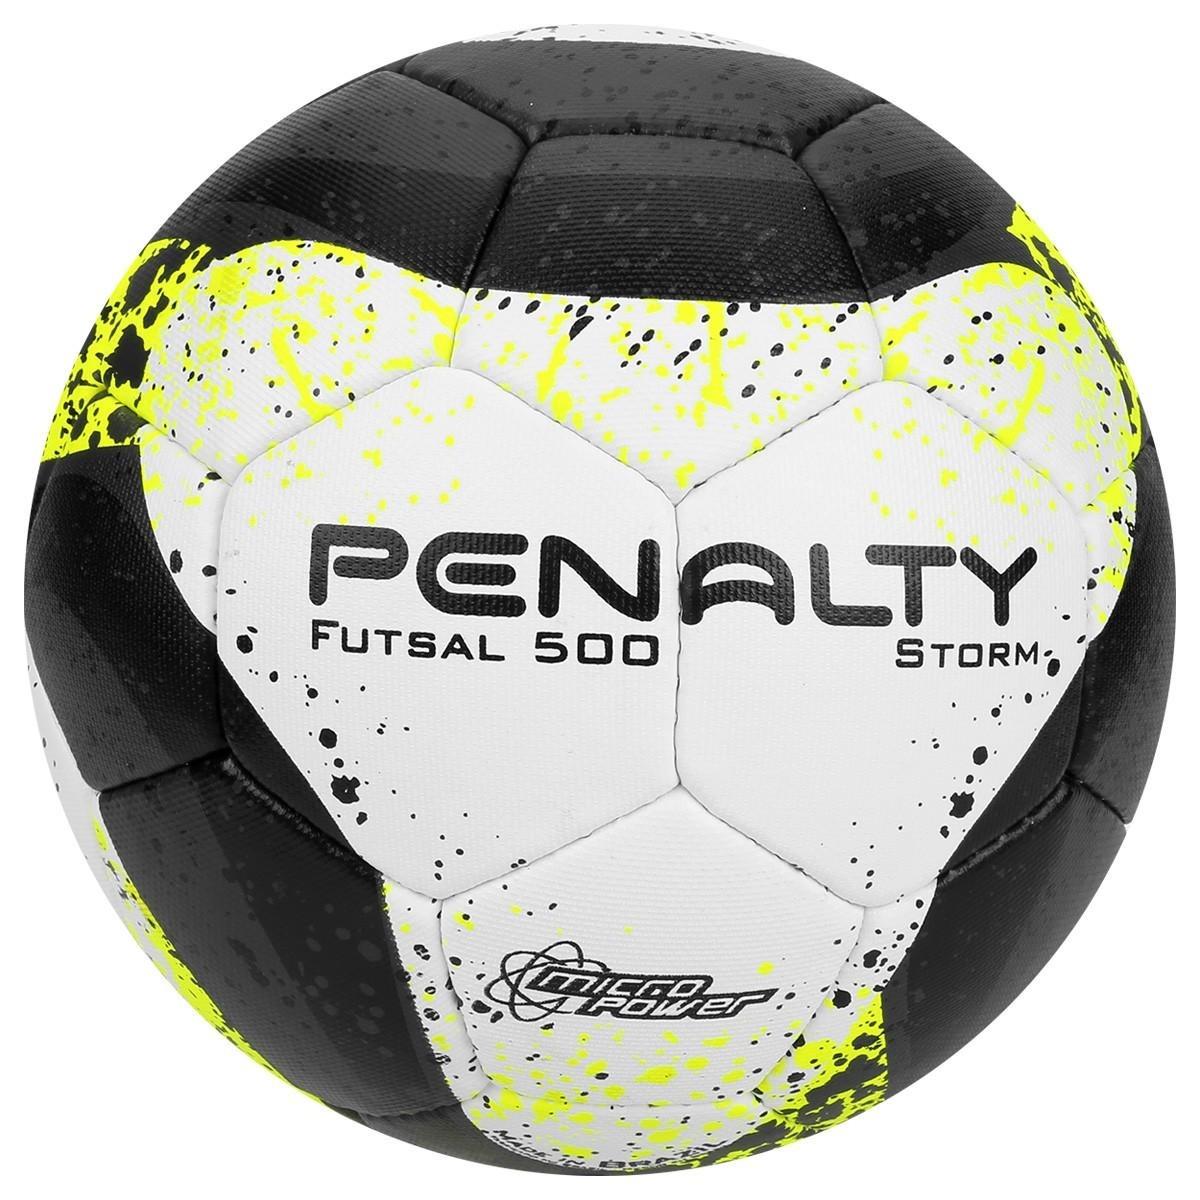 1d5ebcfe16 Bola Futsal 500 Penalty Storm Costurada Vii - R  54